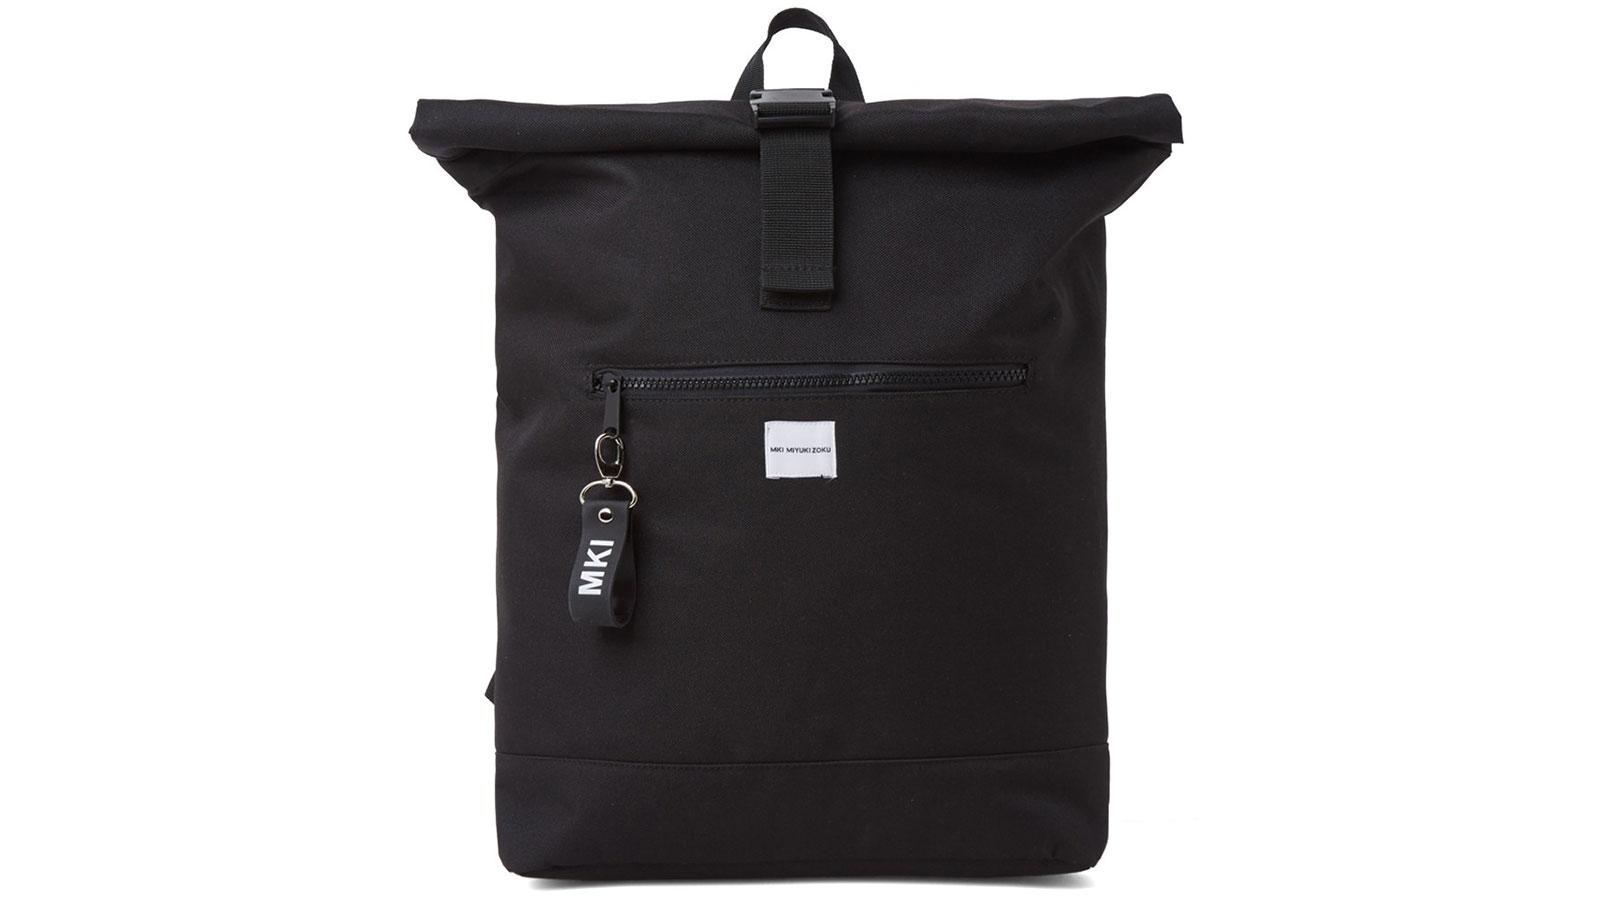 MKI 600 Rolltop Bag | best rolltop backpacks